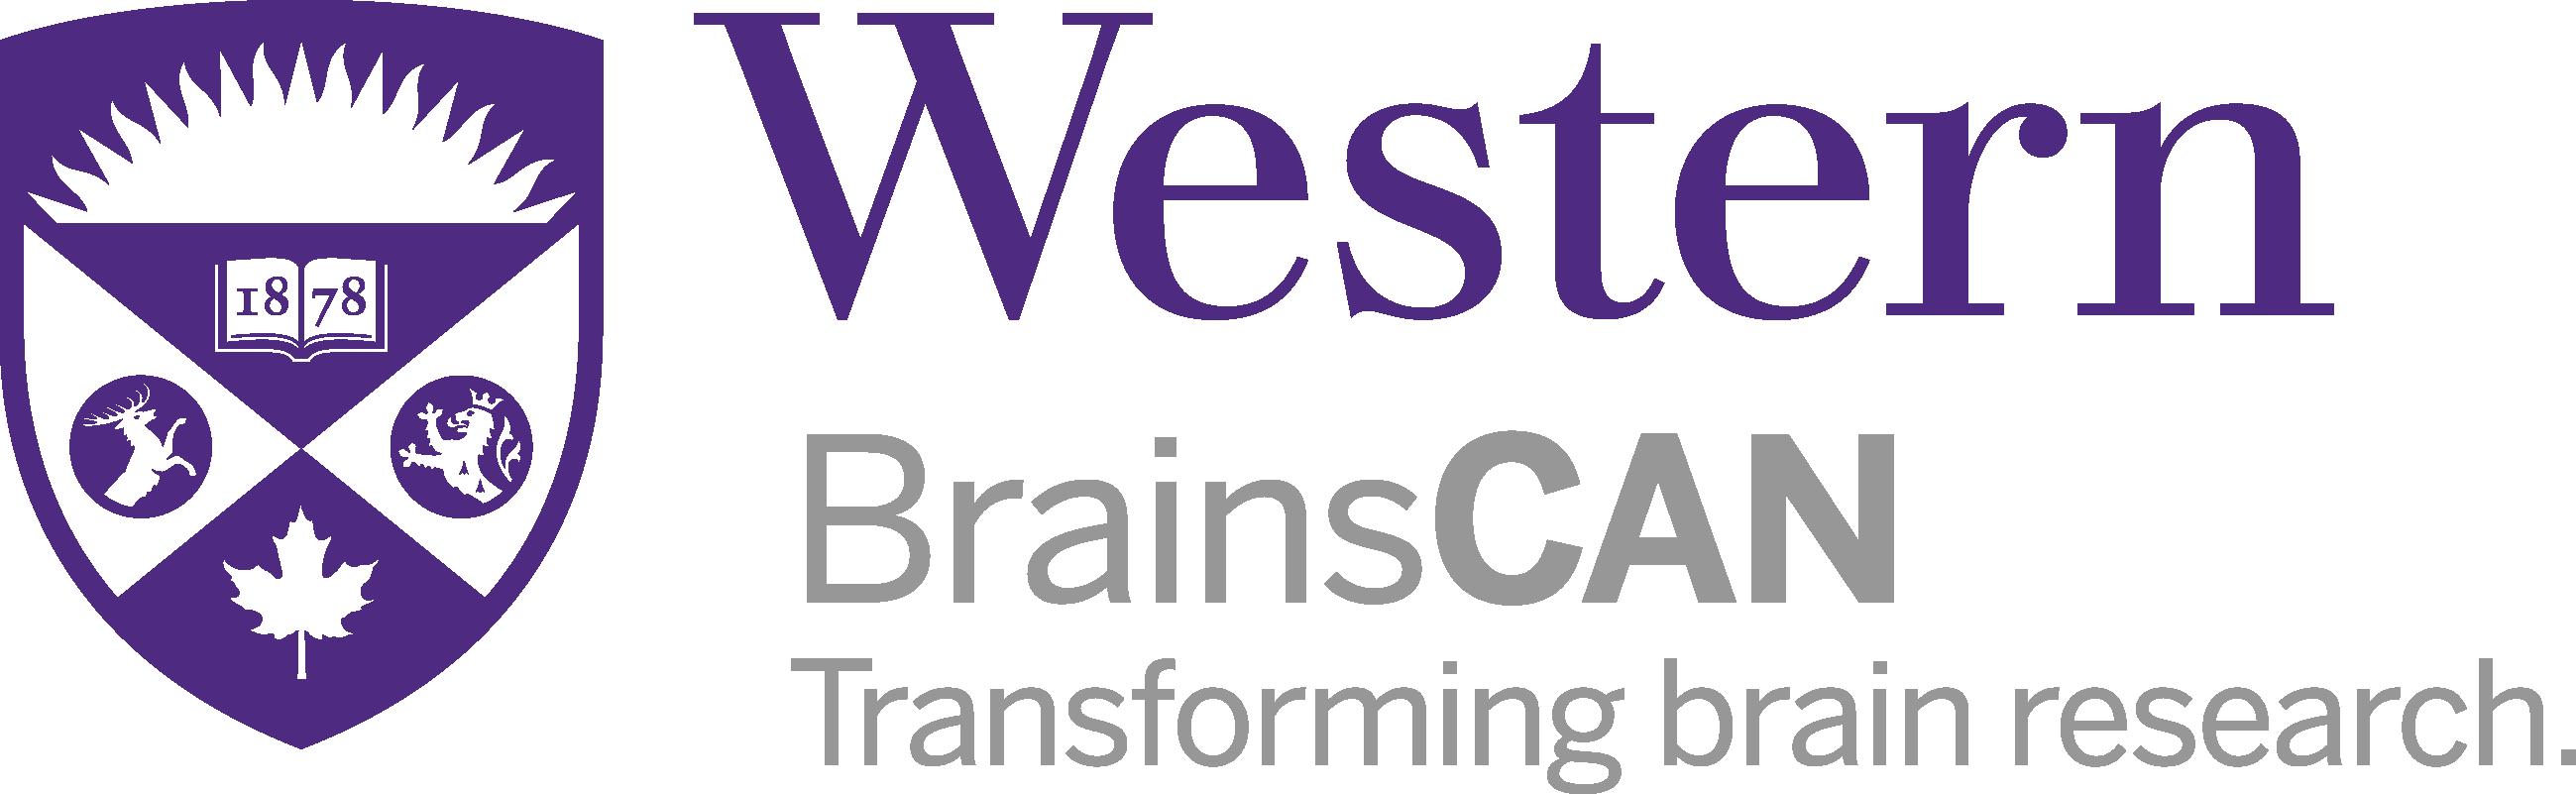 brain bee The latest tweets from british brain bee (@brainbee_uk) neuorscience for kids united kingdom.